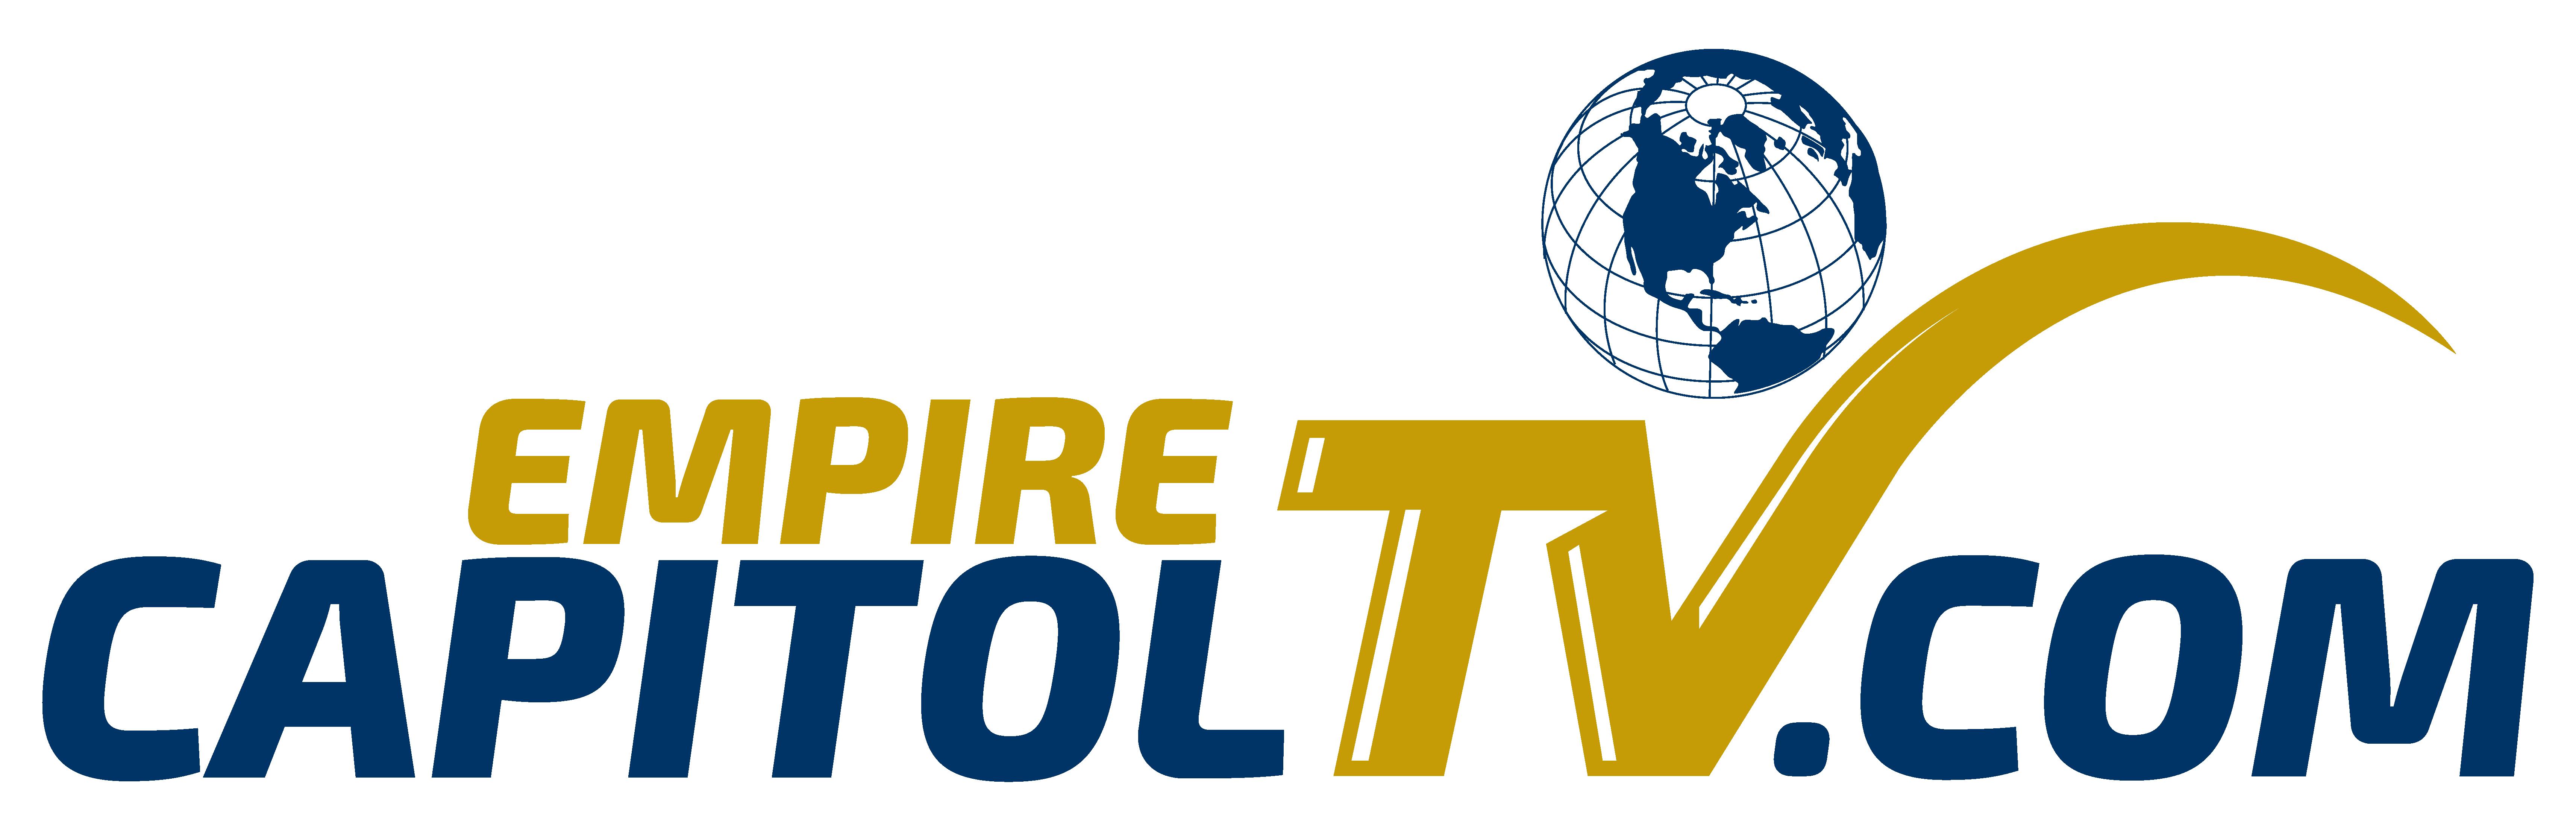 EmpireCapitolTV.com